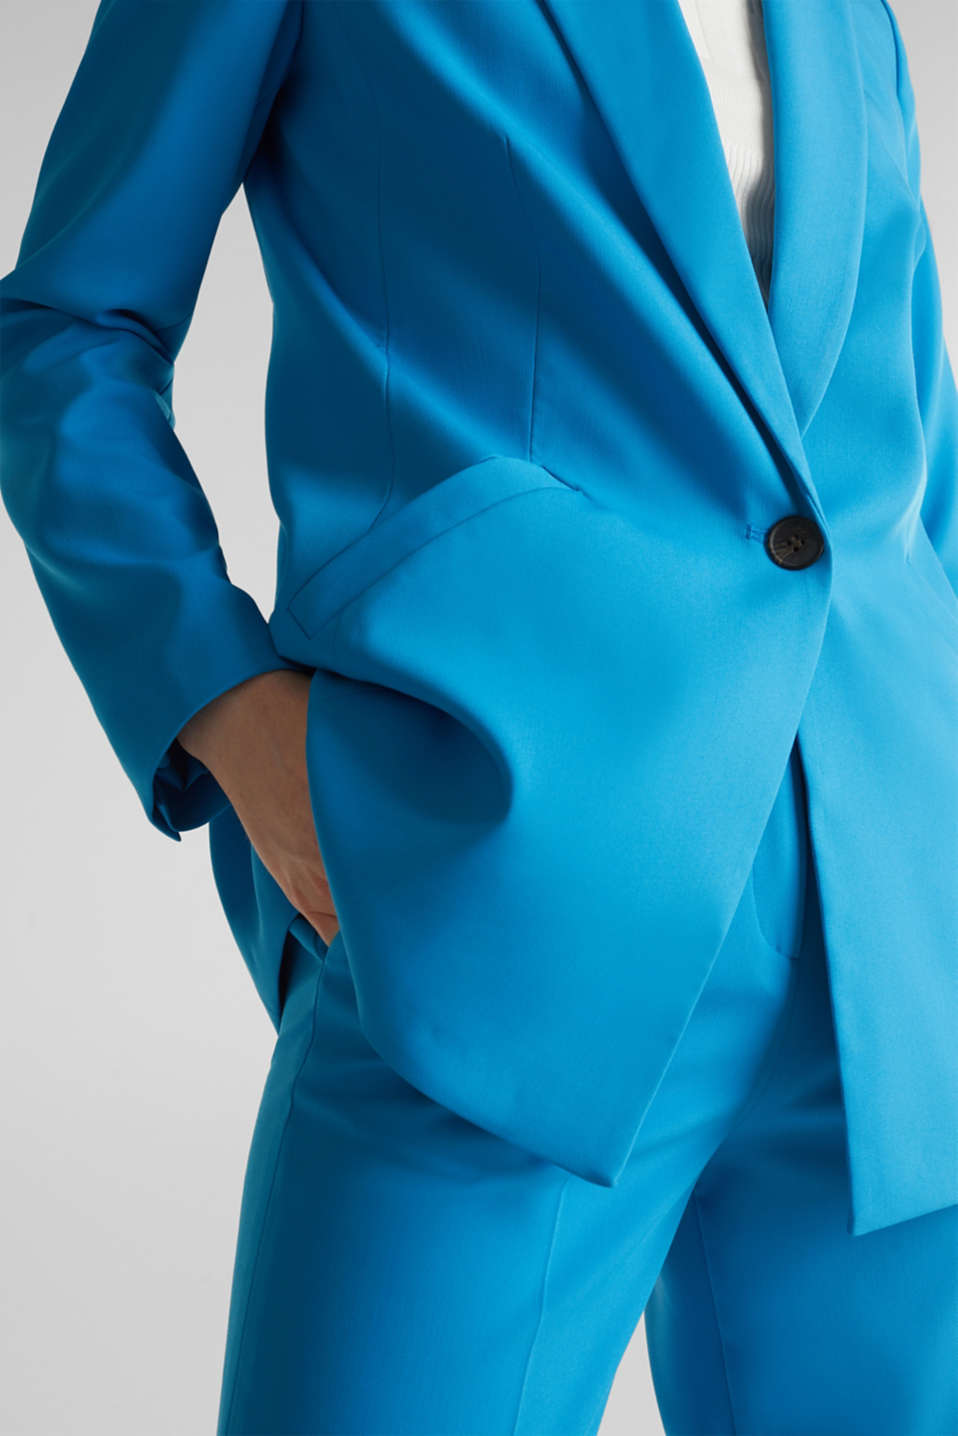 SHIMMER mix + match stretch blazer, DARK TURQUOISE, detail image number 2